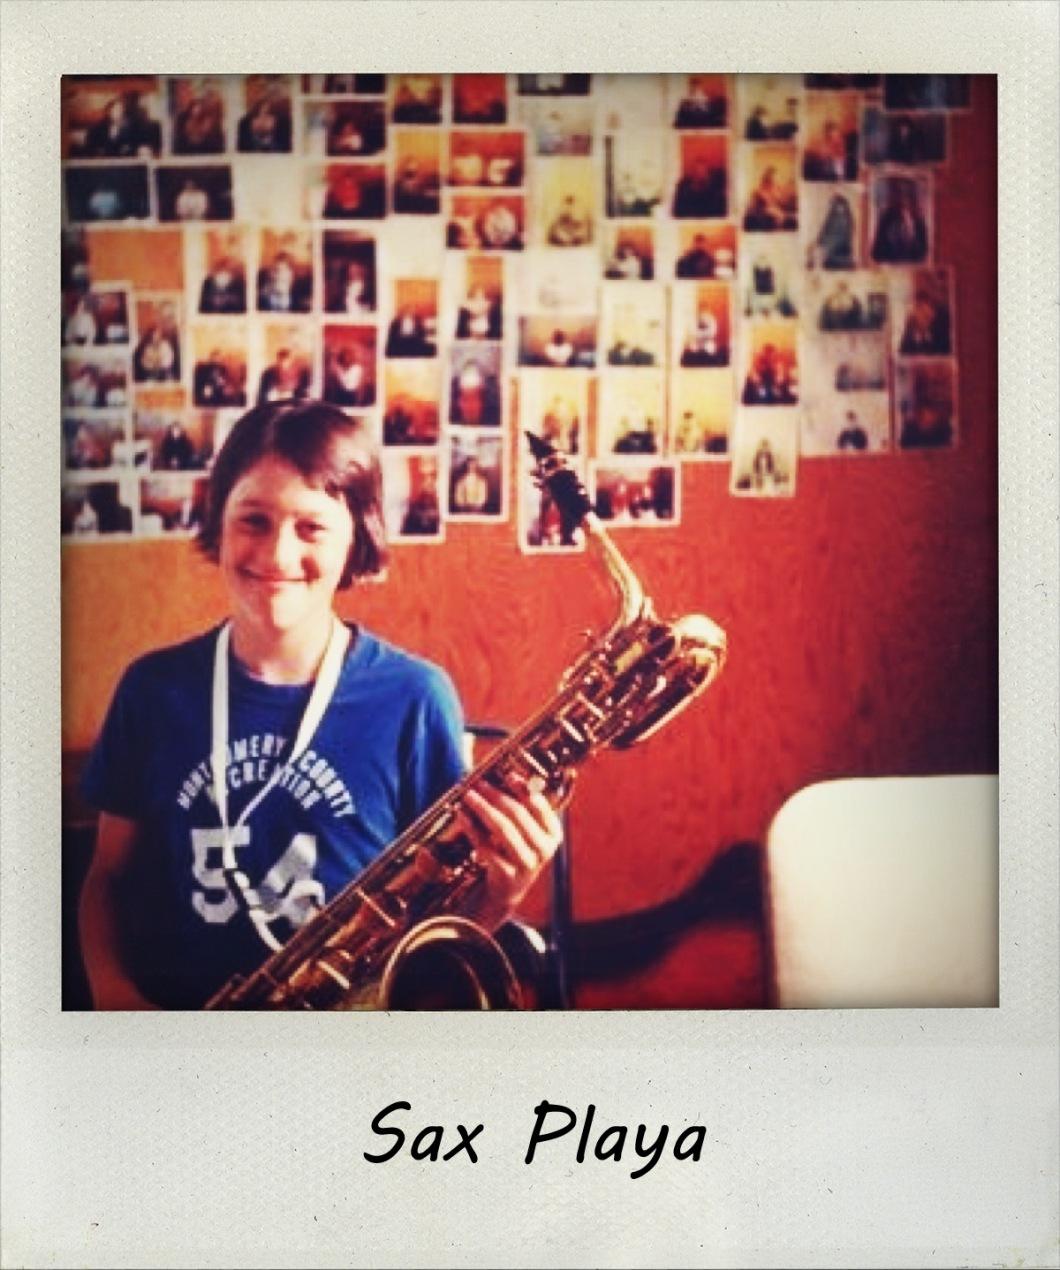 Sax Player '78